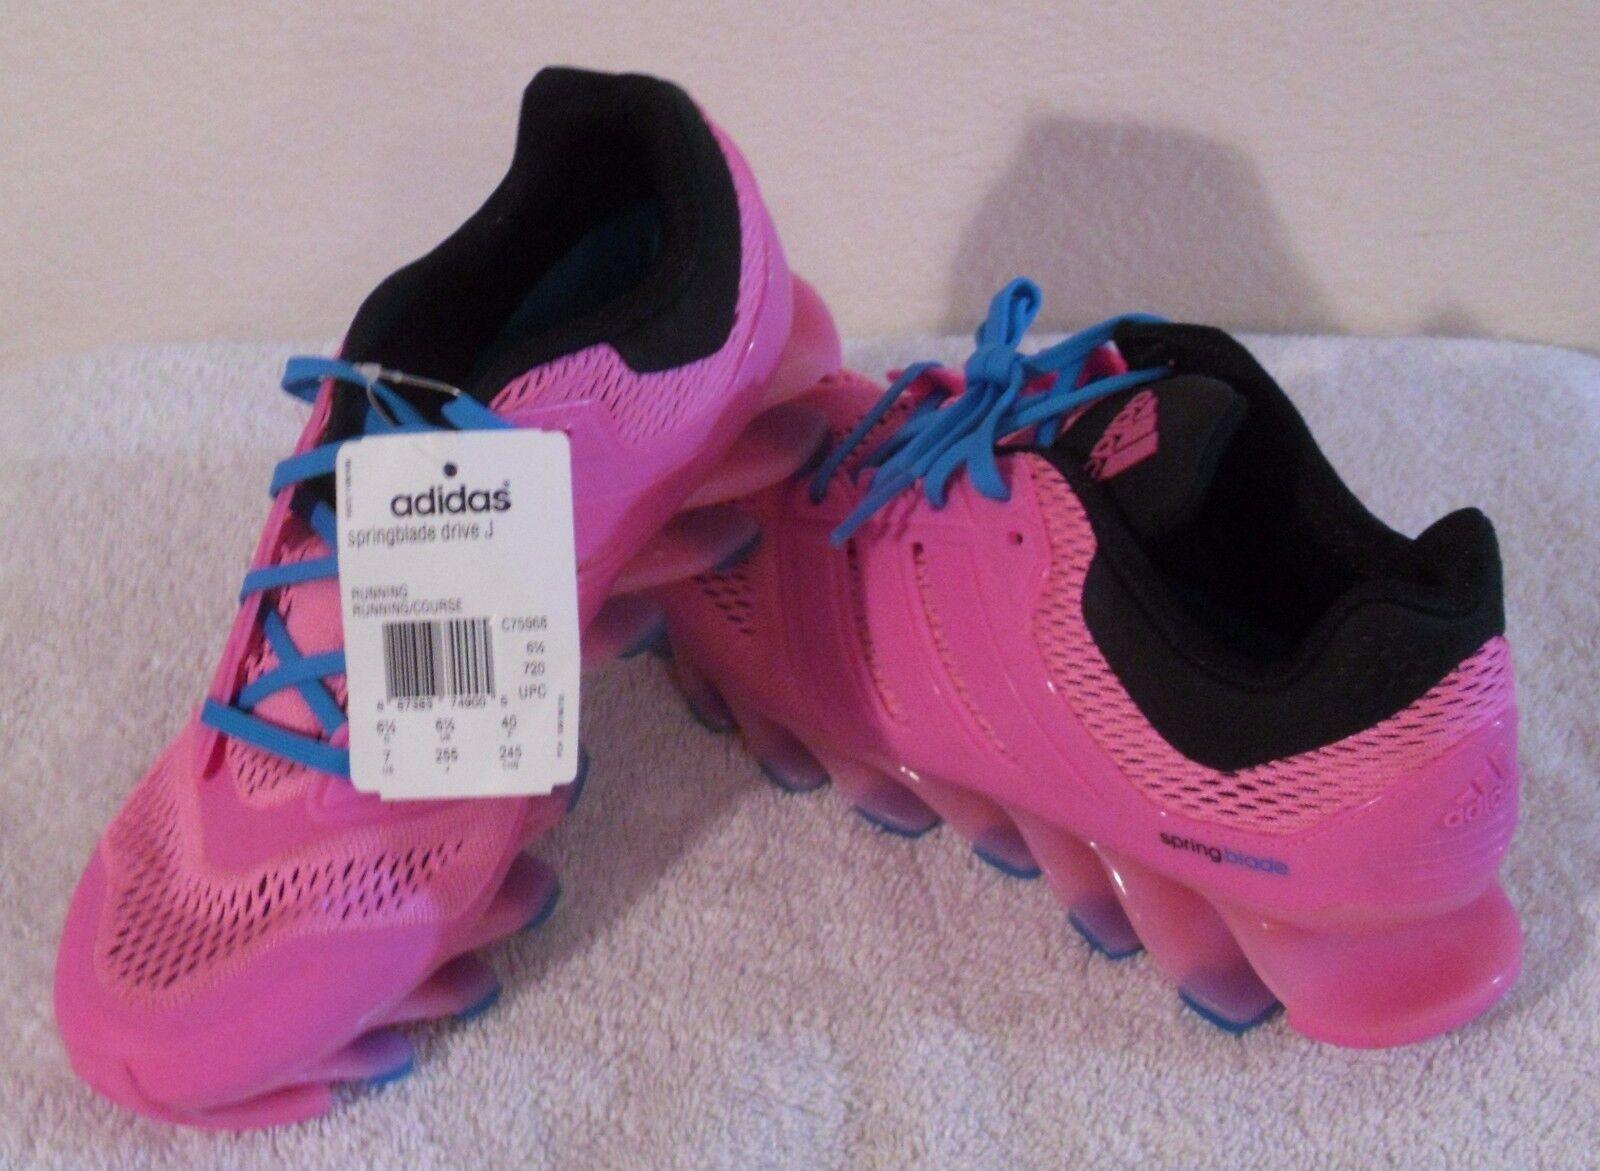 Nwt adidas springblade guidare j giovani ragazze - scarpette rosa msrp 140 - ragazze 7 e1b67c